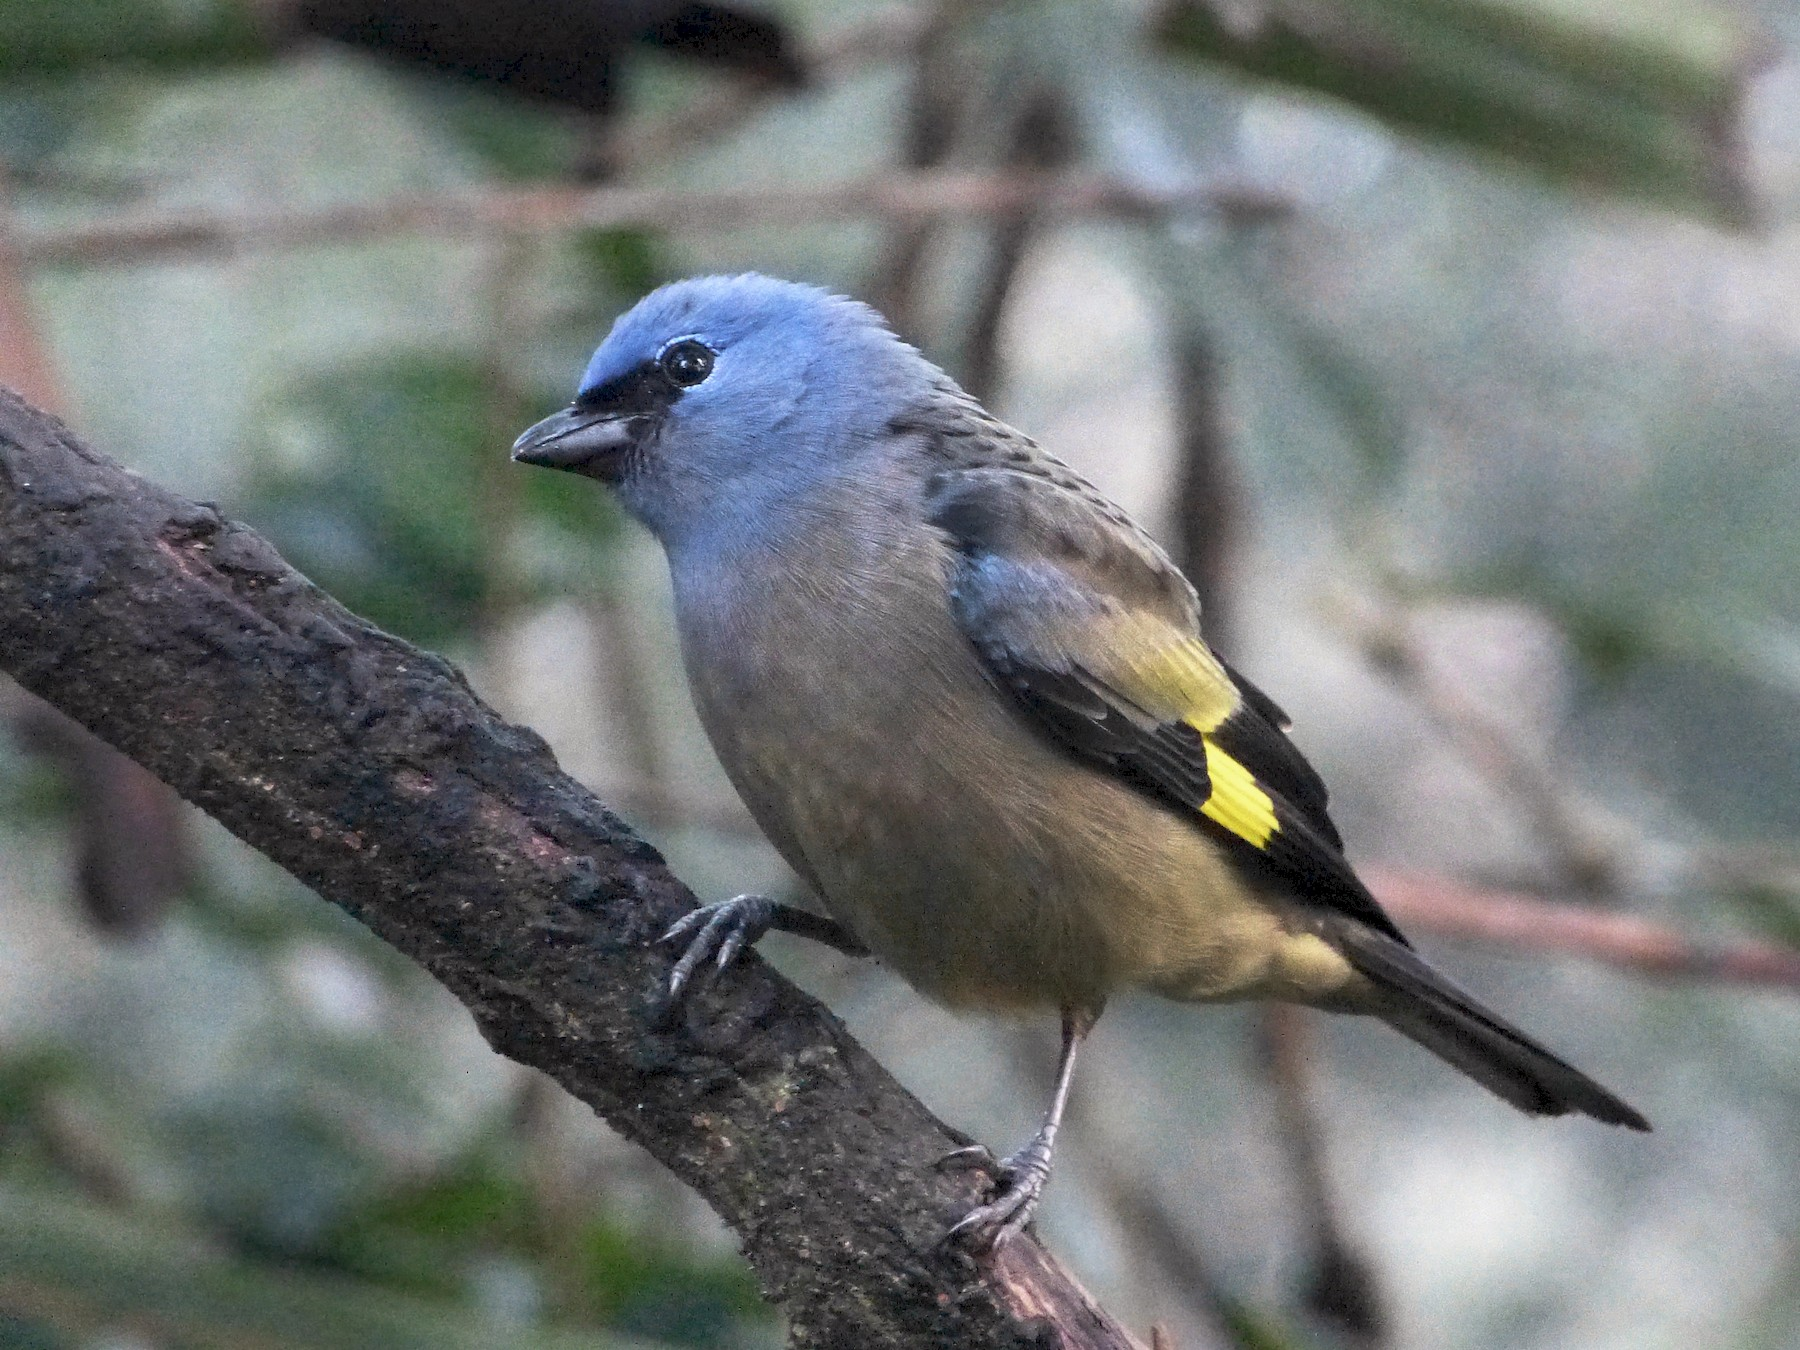 Yellow-winged Tanager - Shelley Rutkin